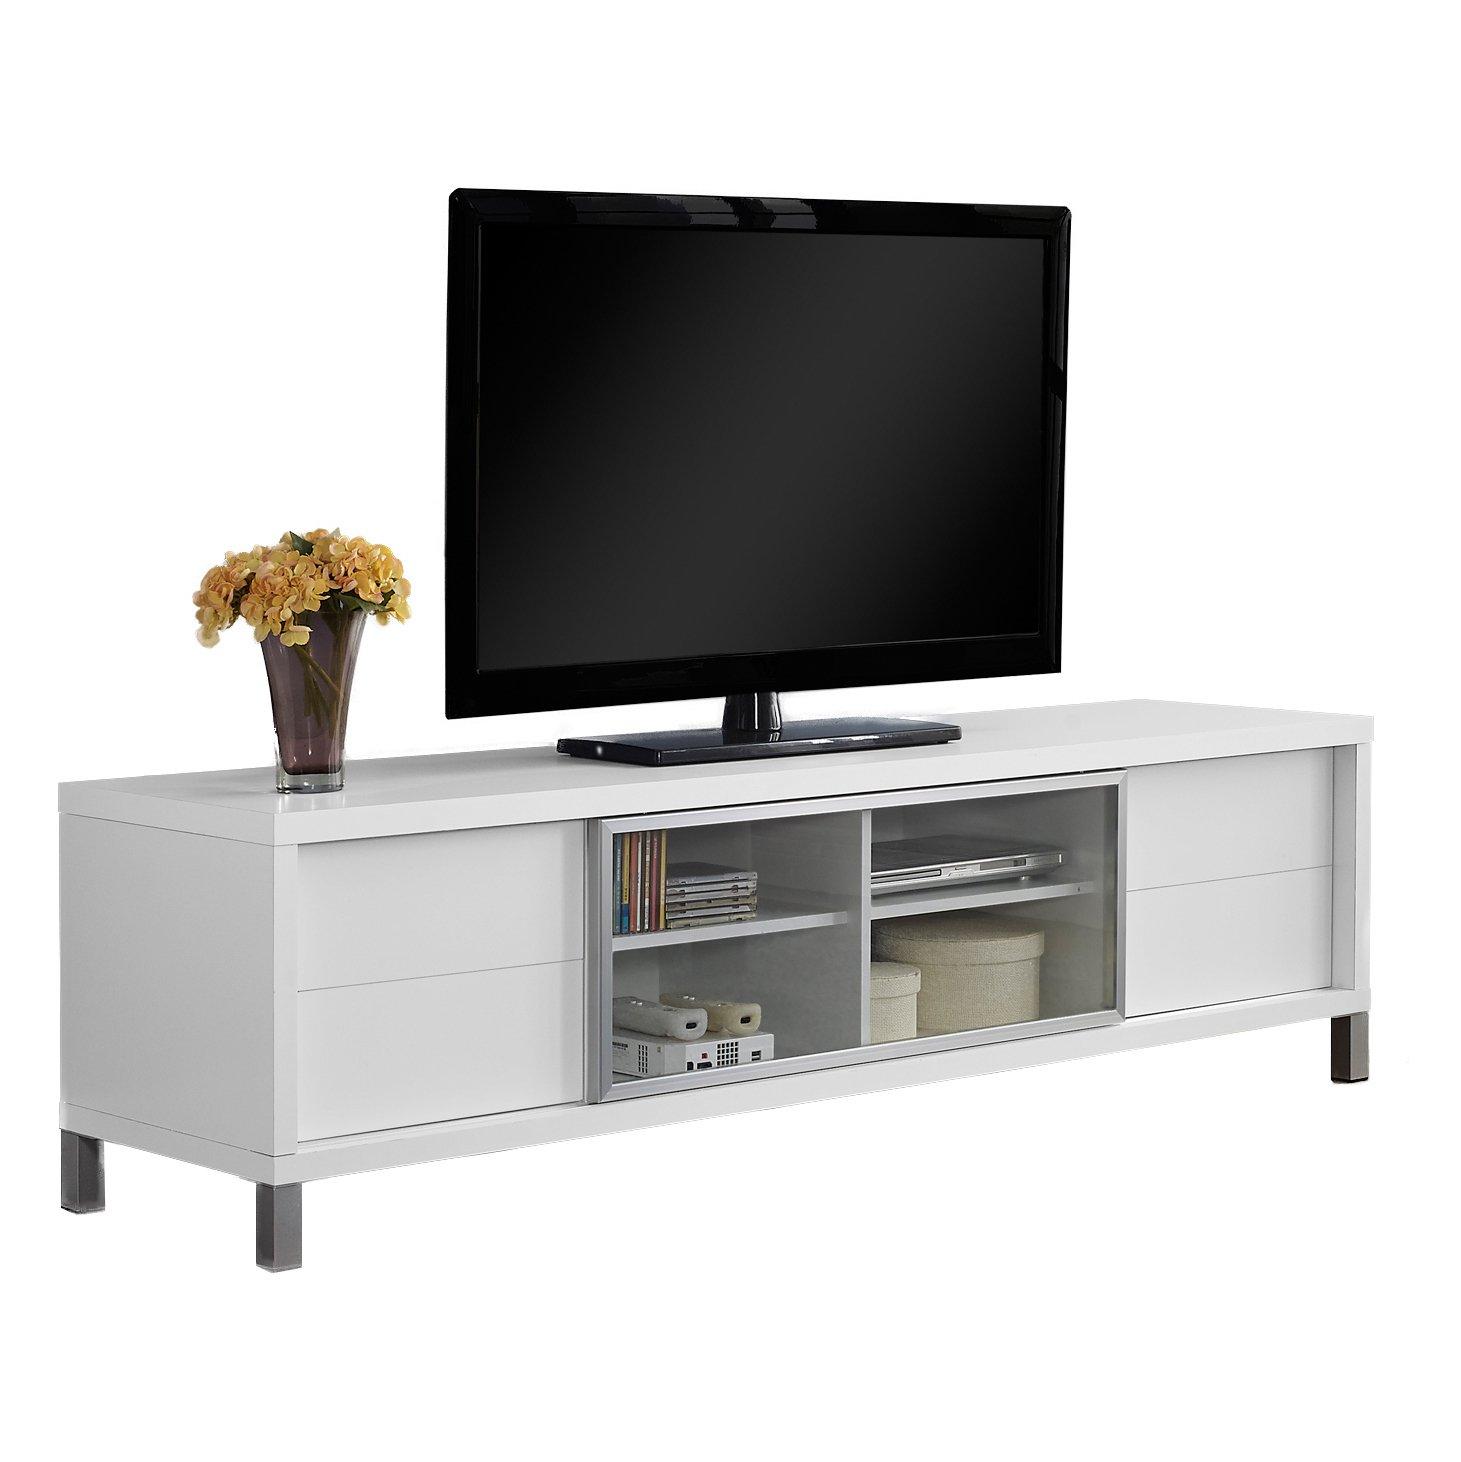 Monarch Specialties I 2537, TV Console, Euro Style, White, 70